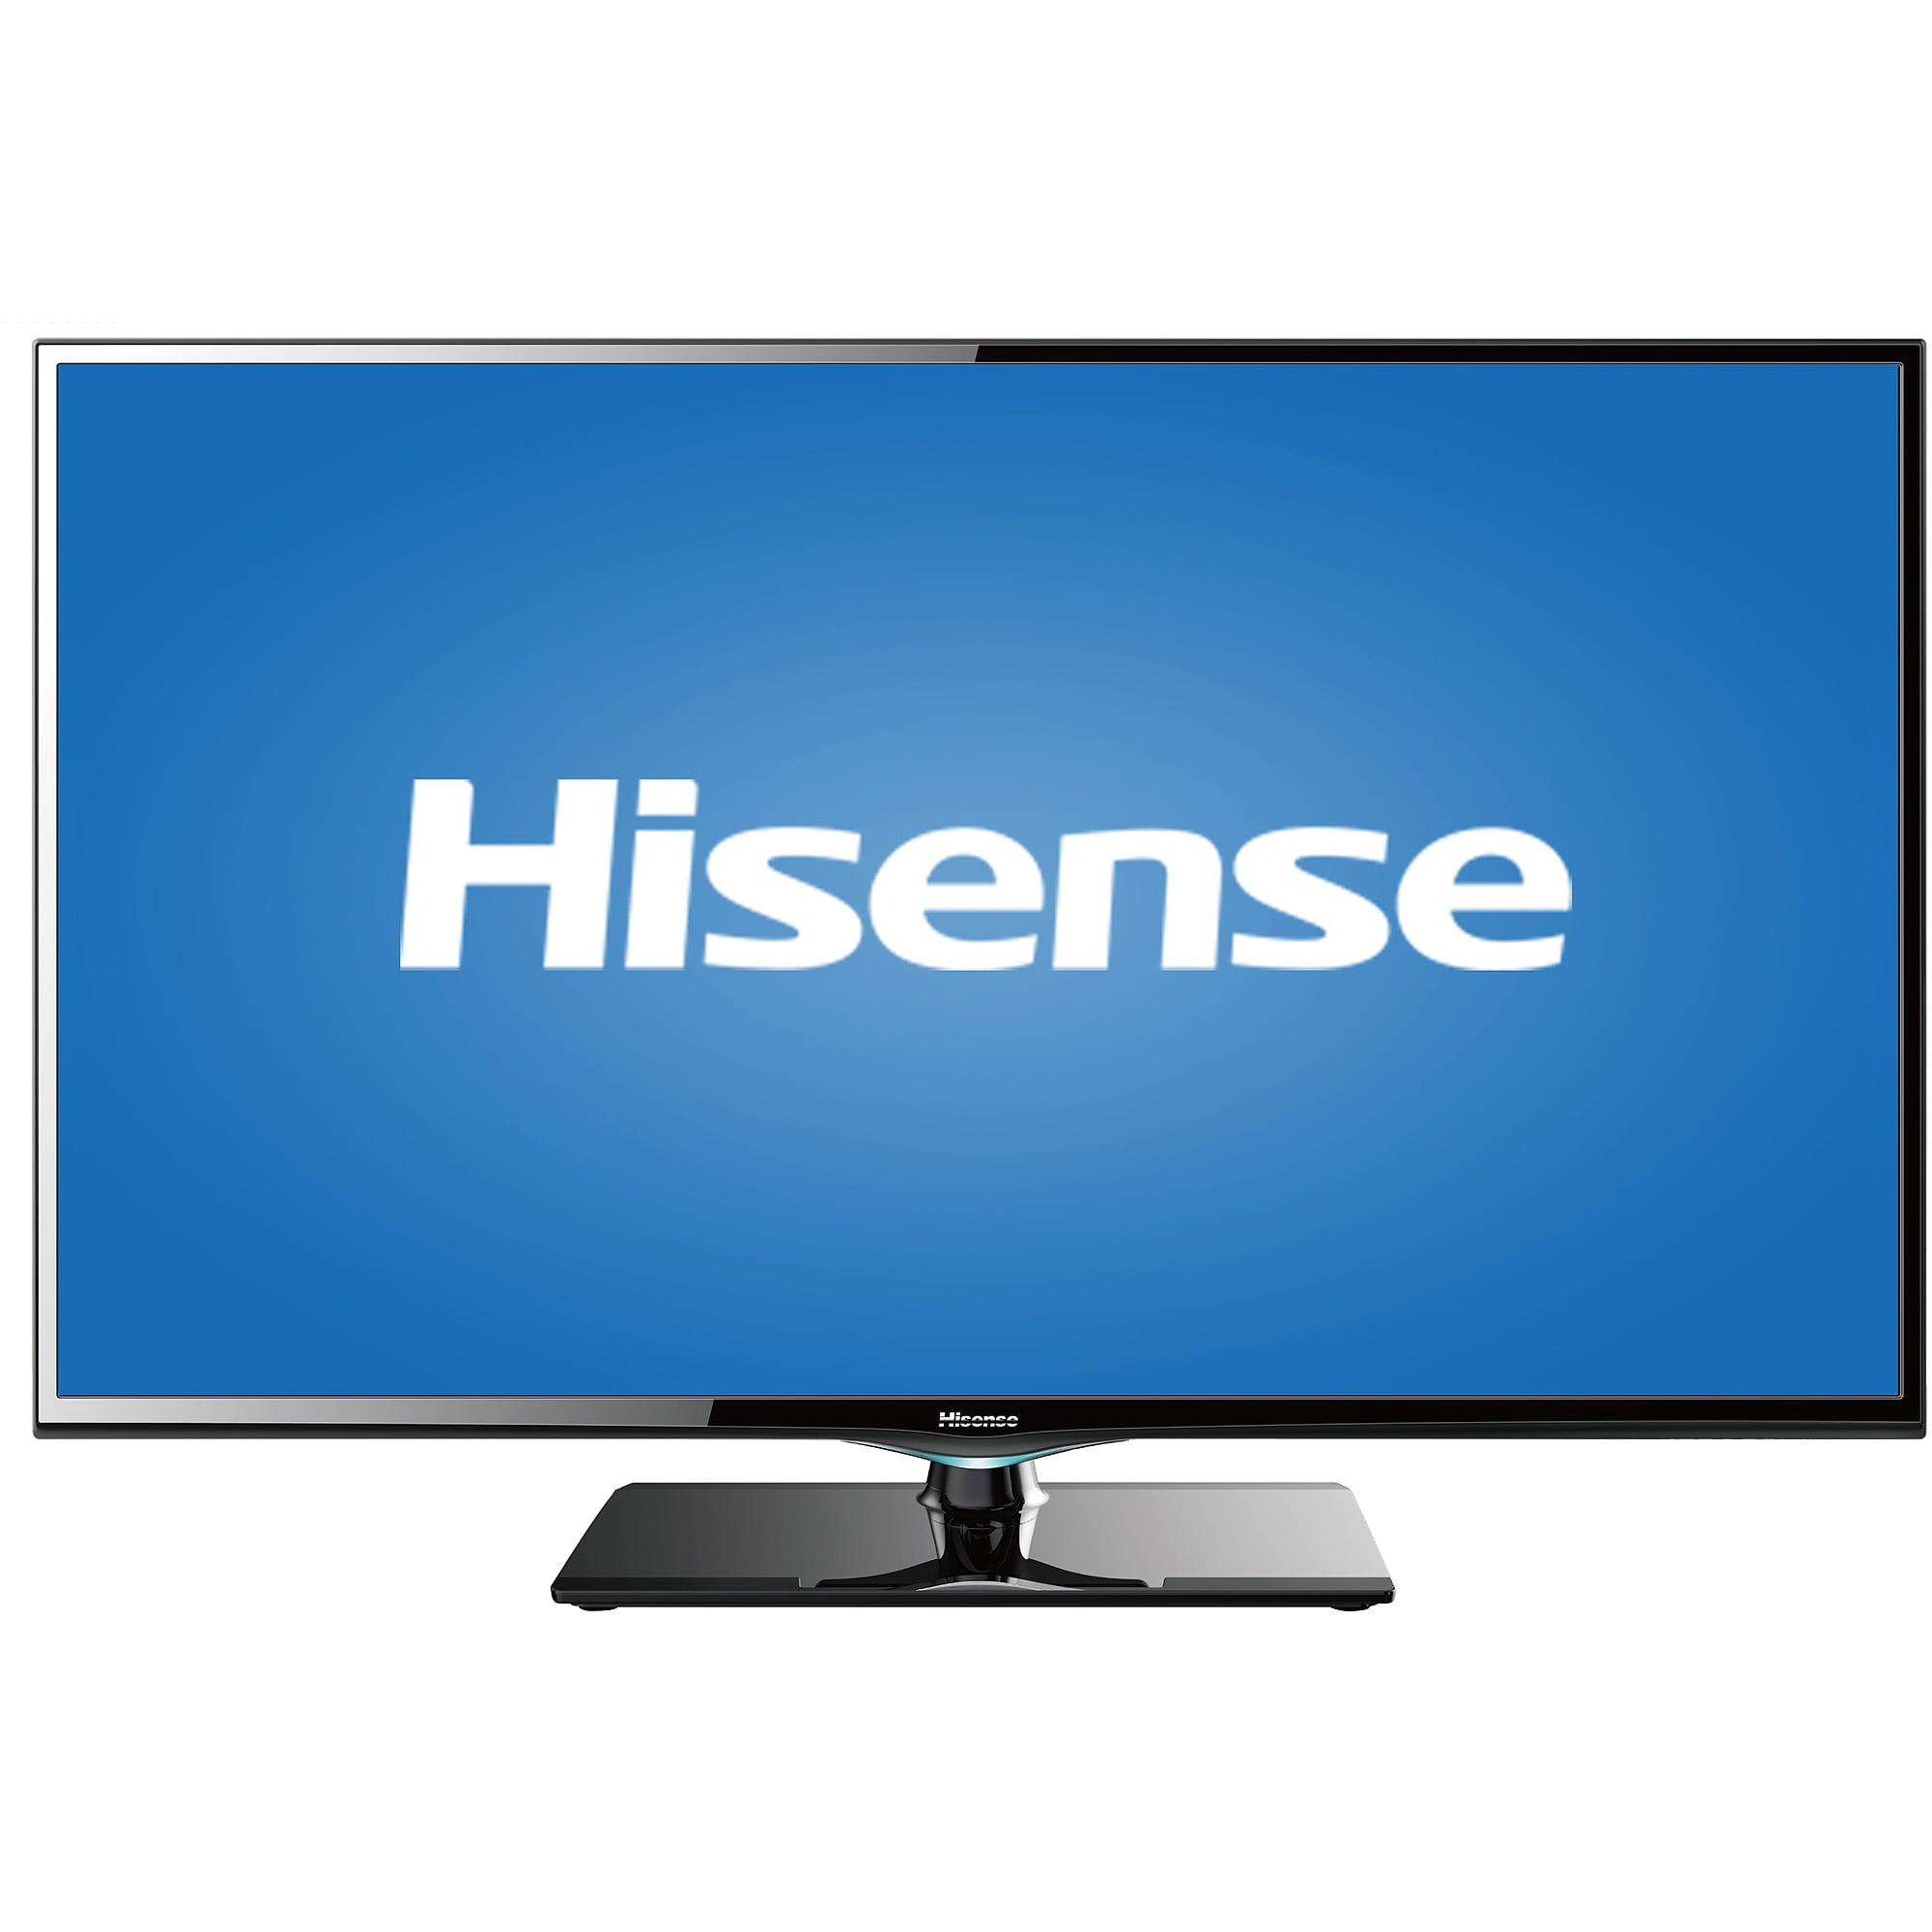 "Hisense 50K360G 50"" 1080p 120Hz LCD LED HDTV"